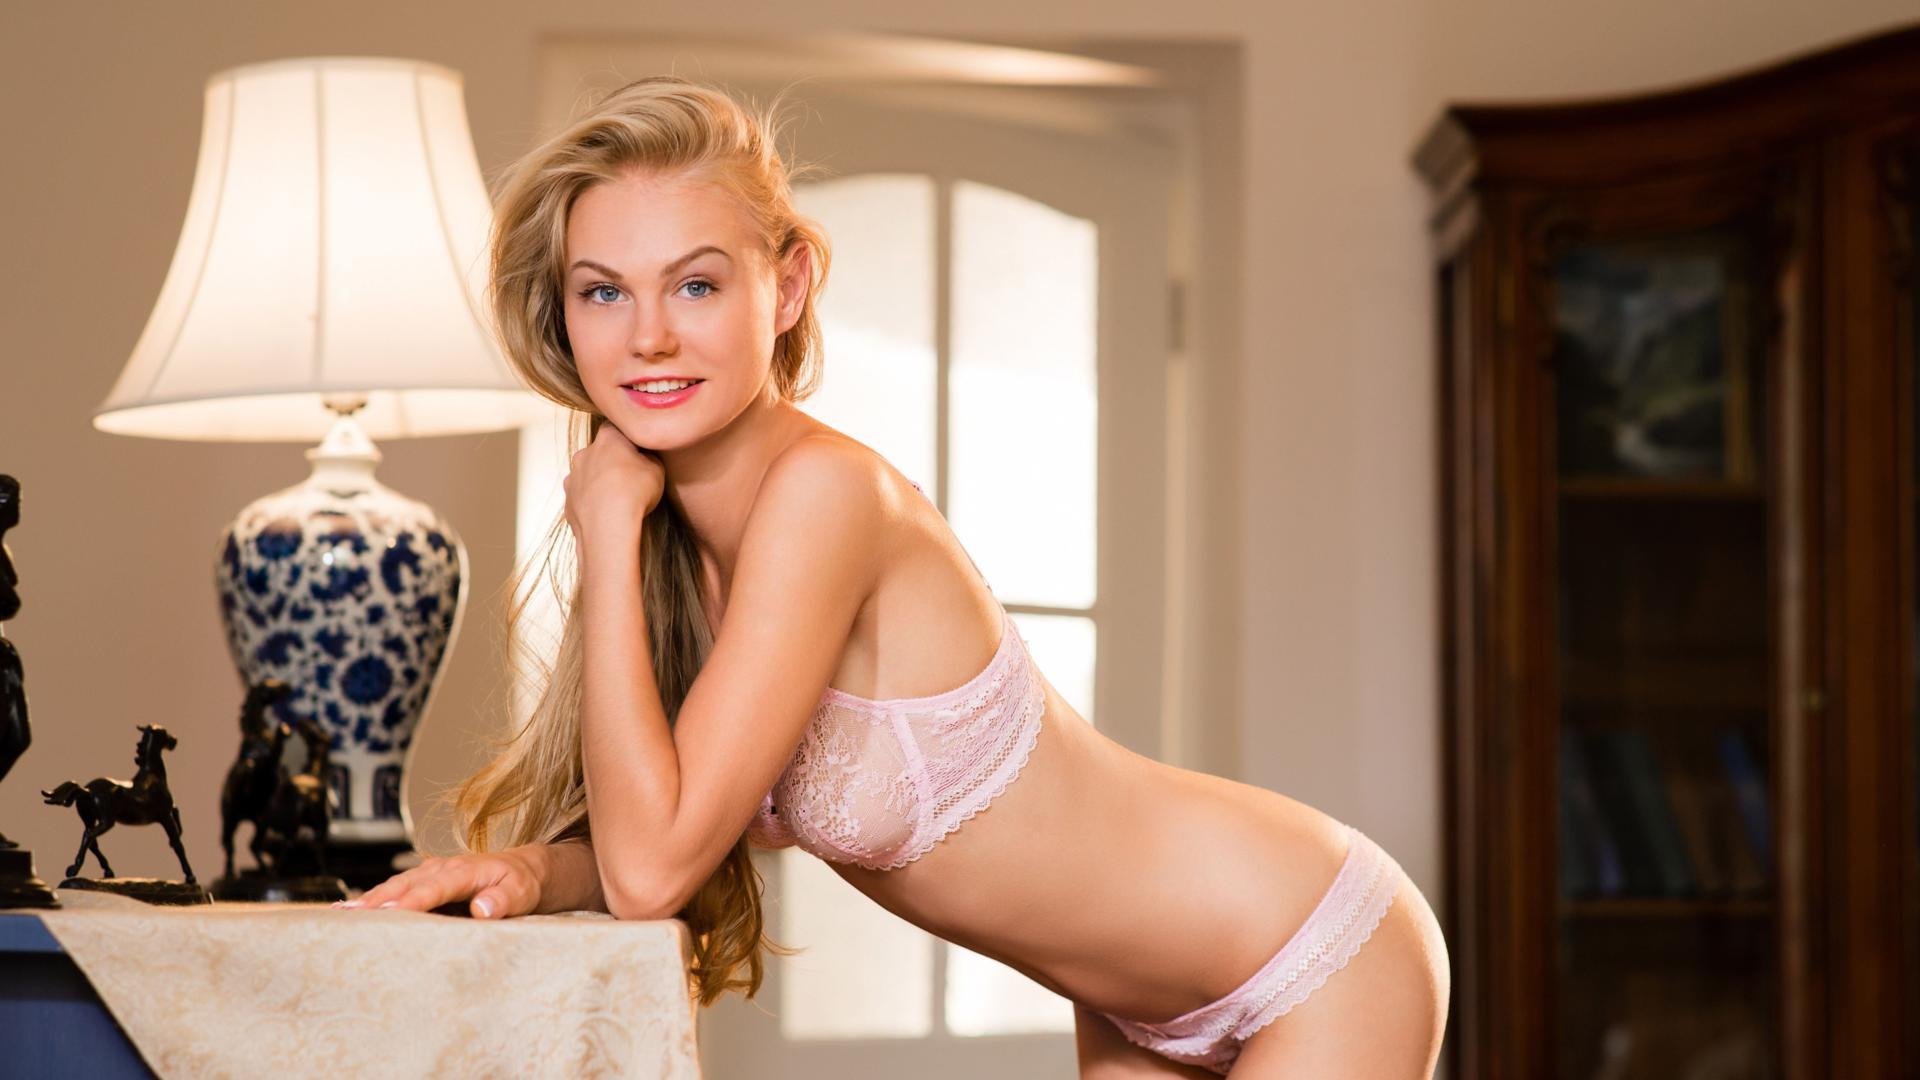 Download photo 1920x1080, erika, sexy girl, adult model